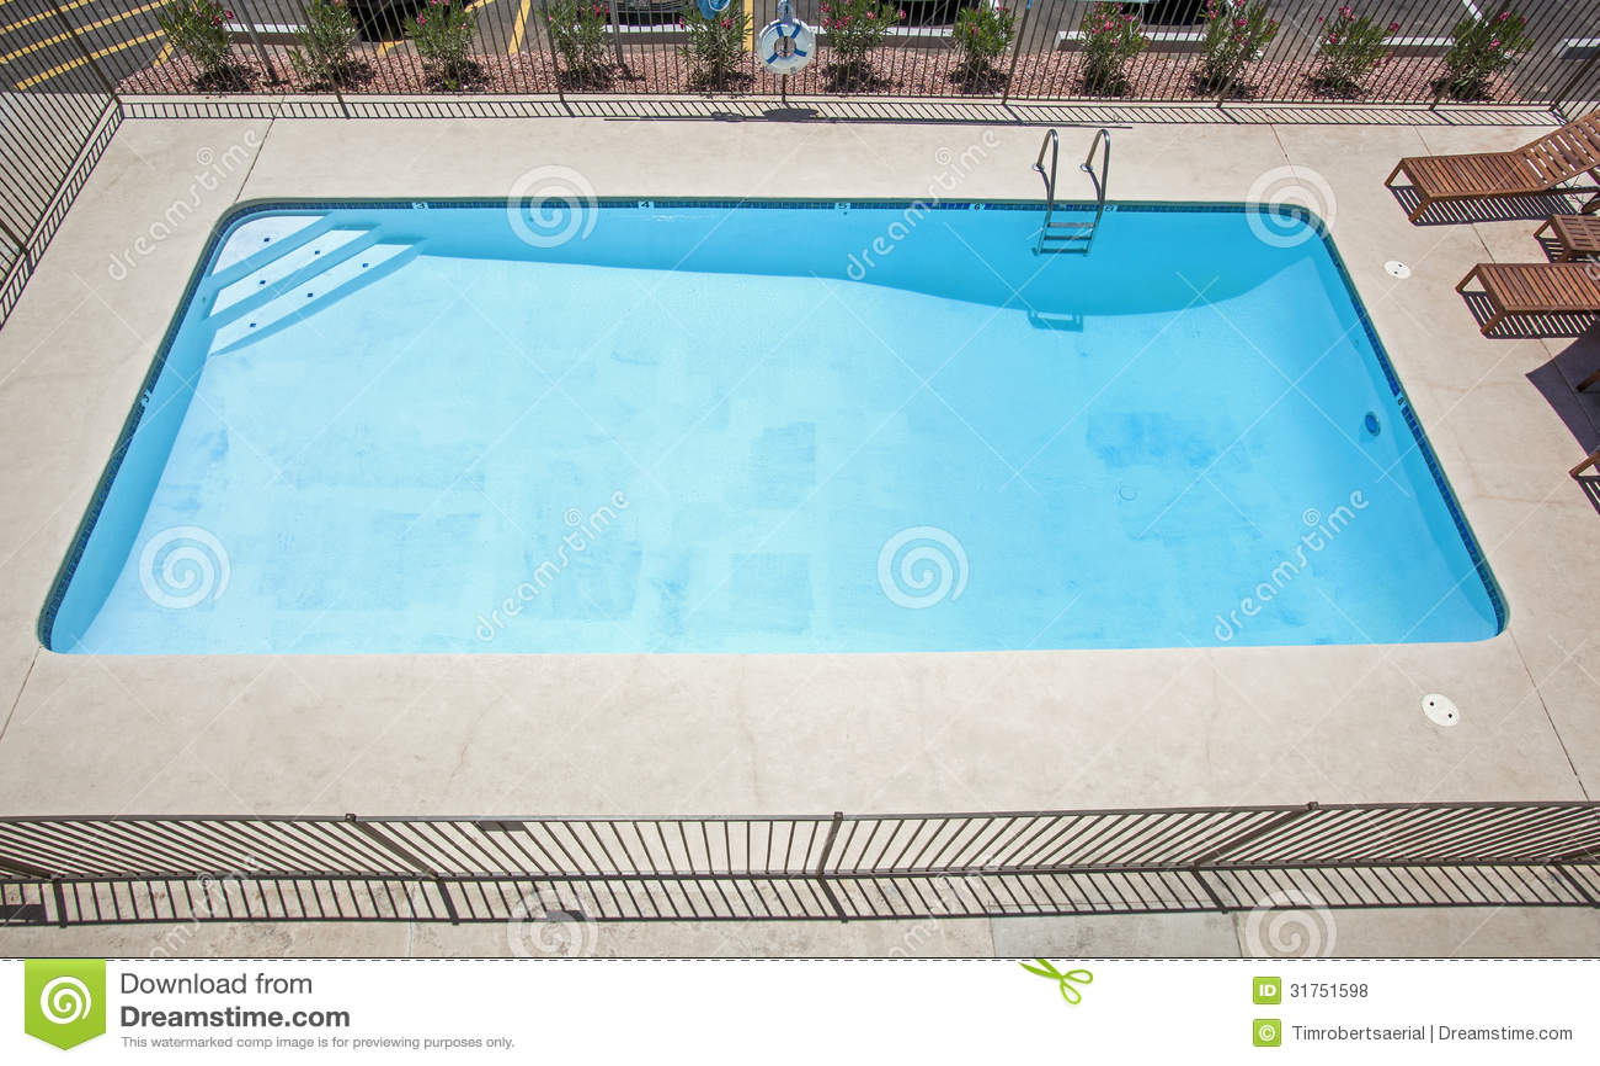 Swimming Pool Royalty Free Stock Photos Image 31751598